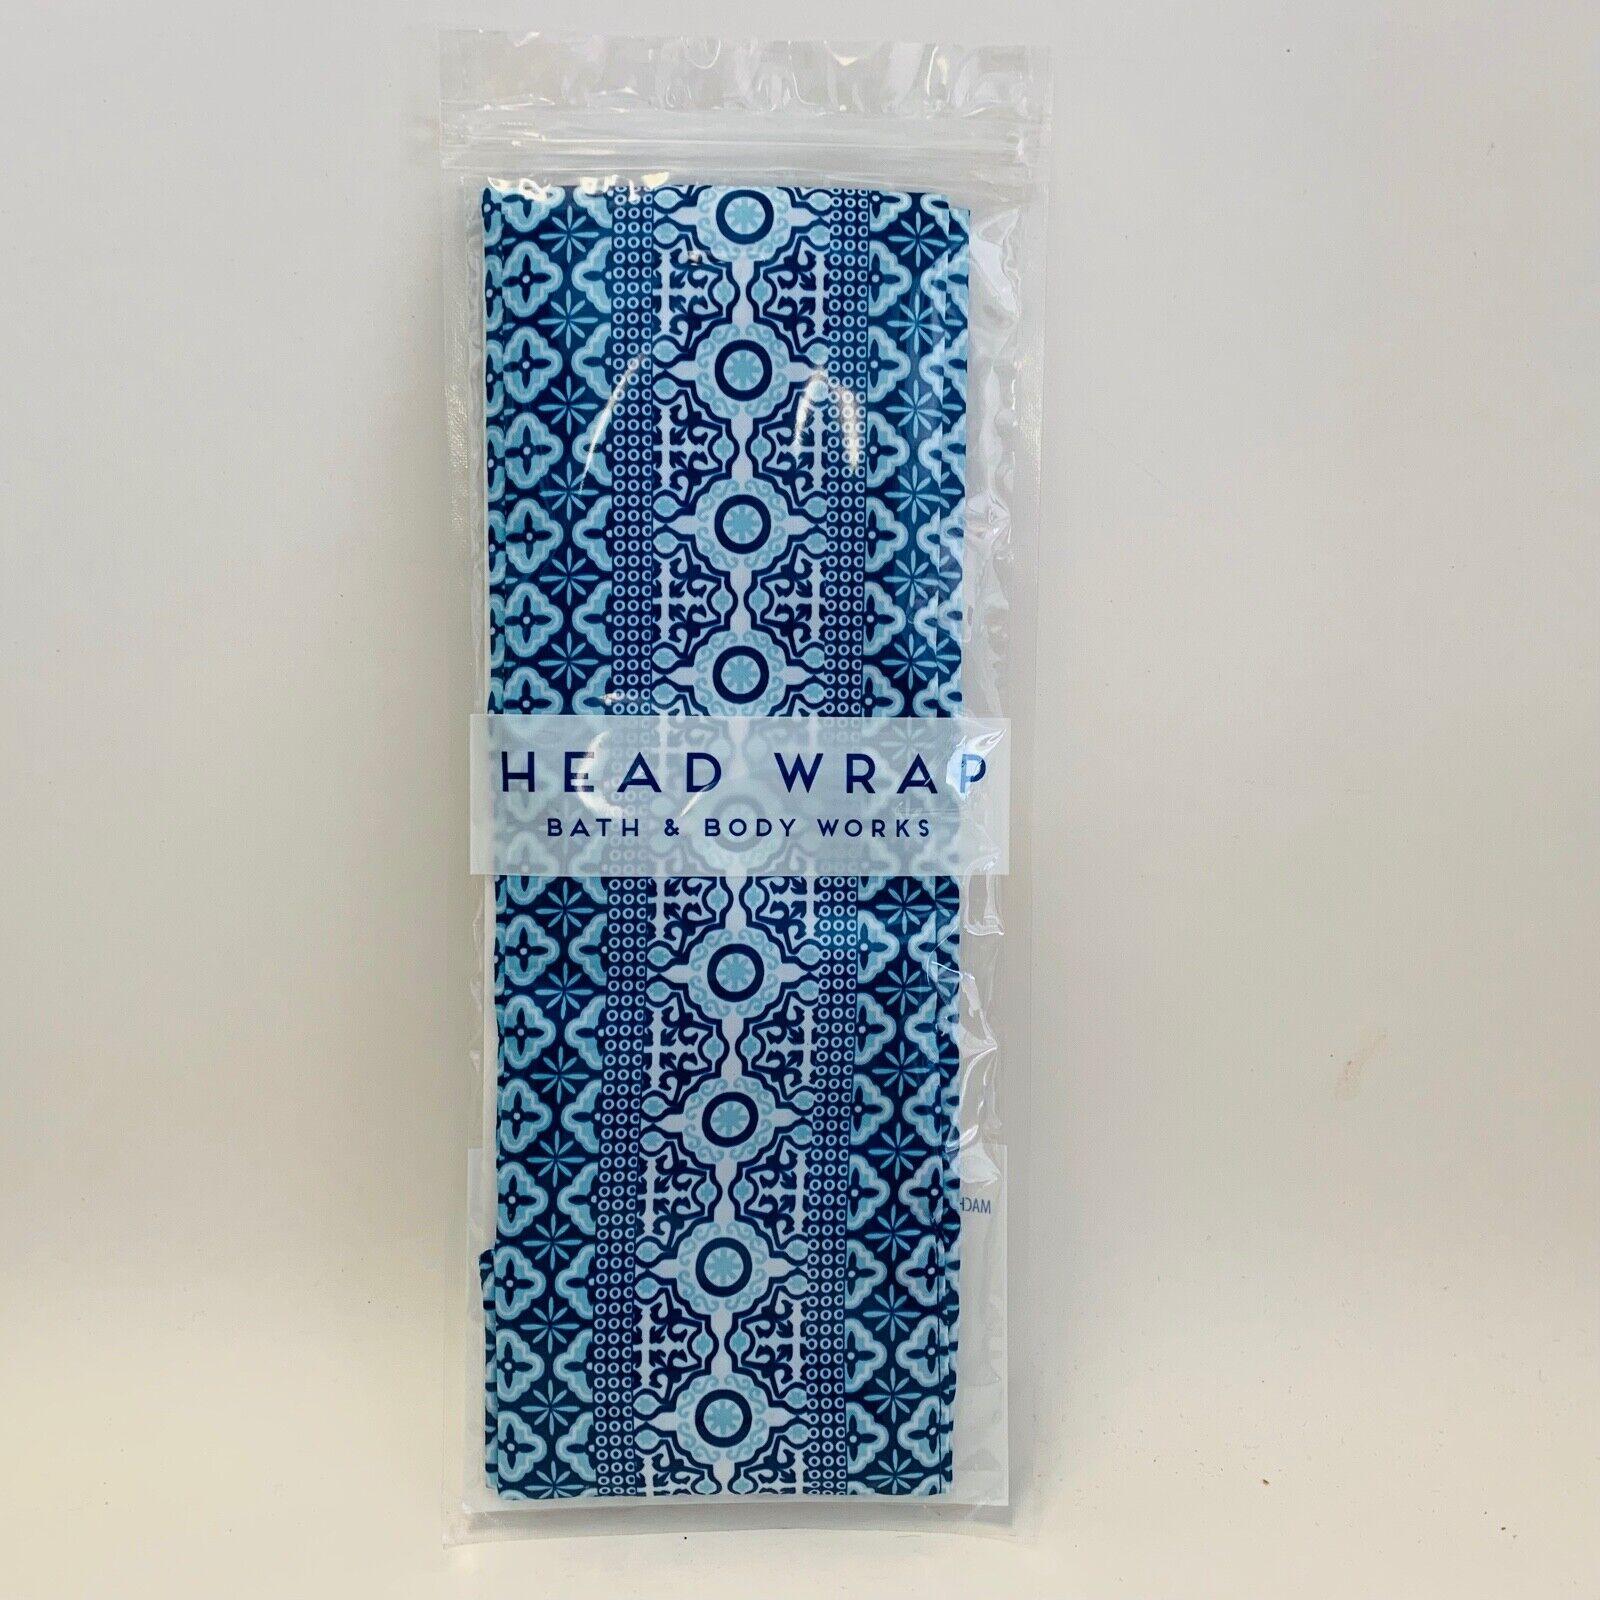 Bath /& Body Works Coastal Head Wrap Band Lightweight Blue Pattern Print One Size